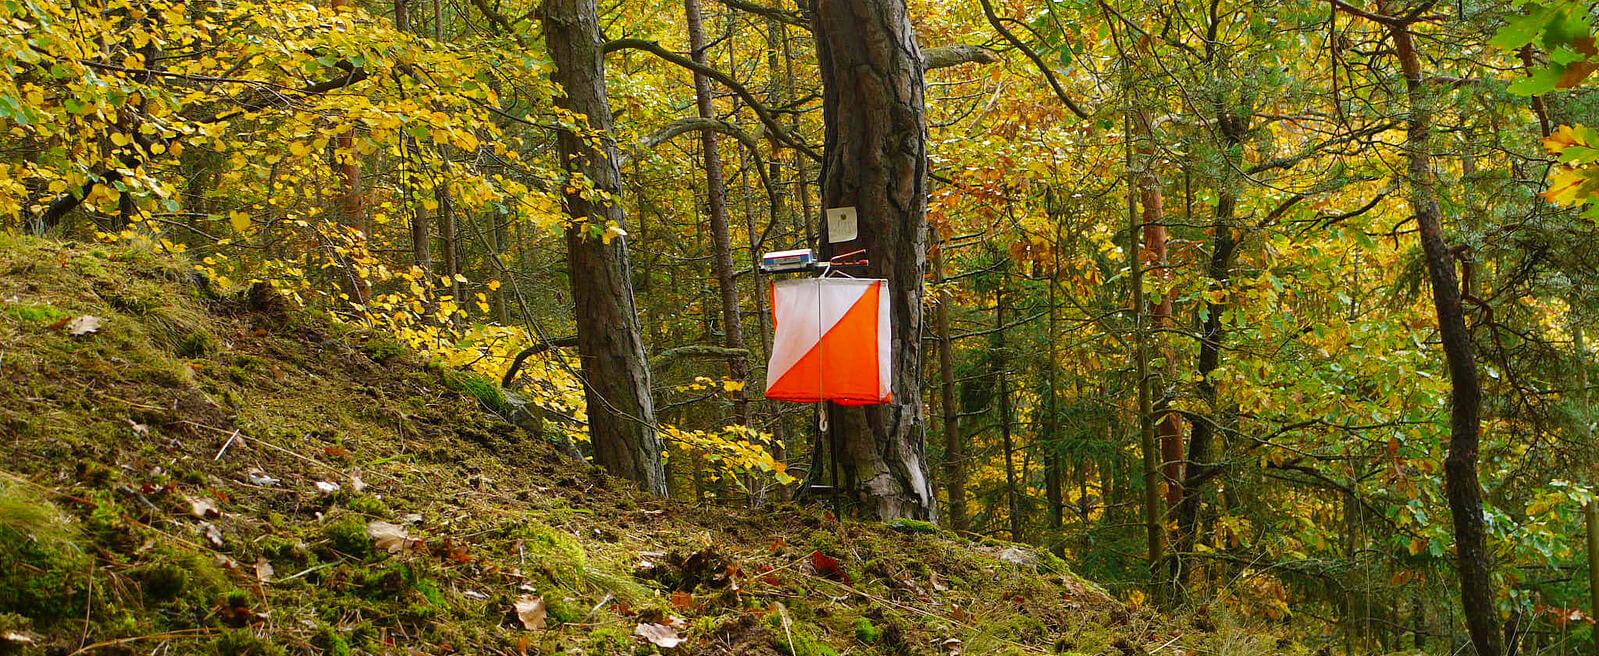 Orienteringsskärm i skog